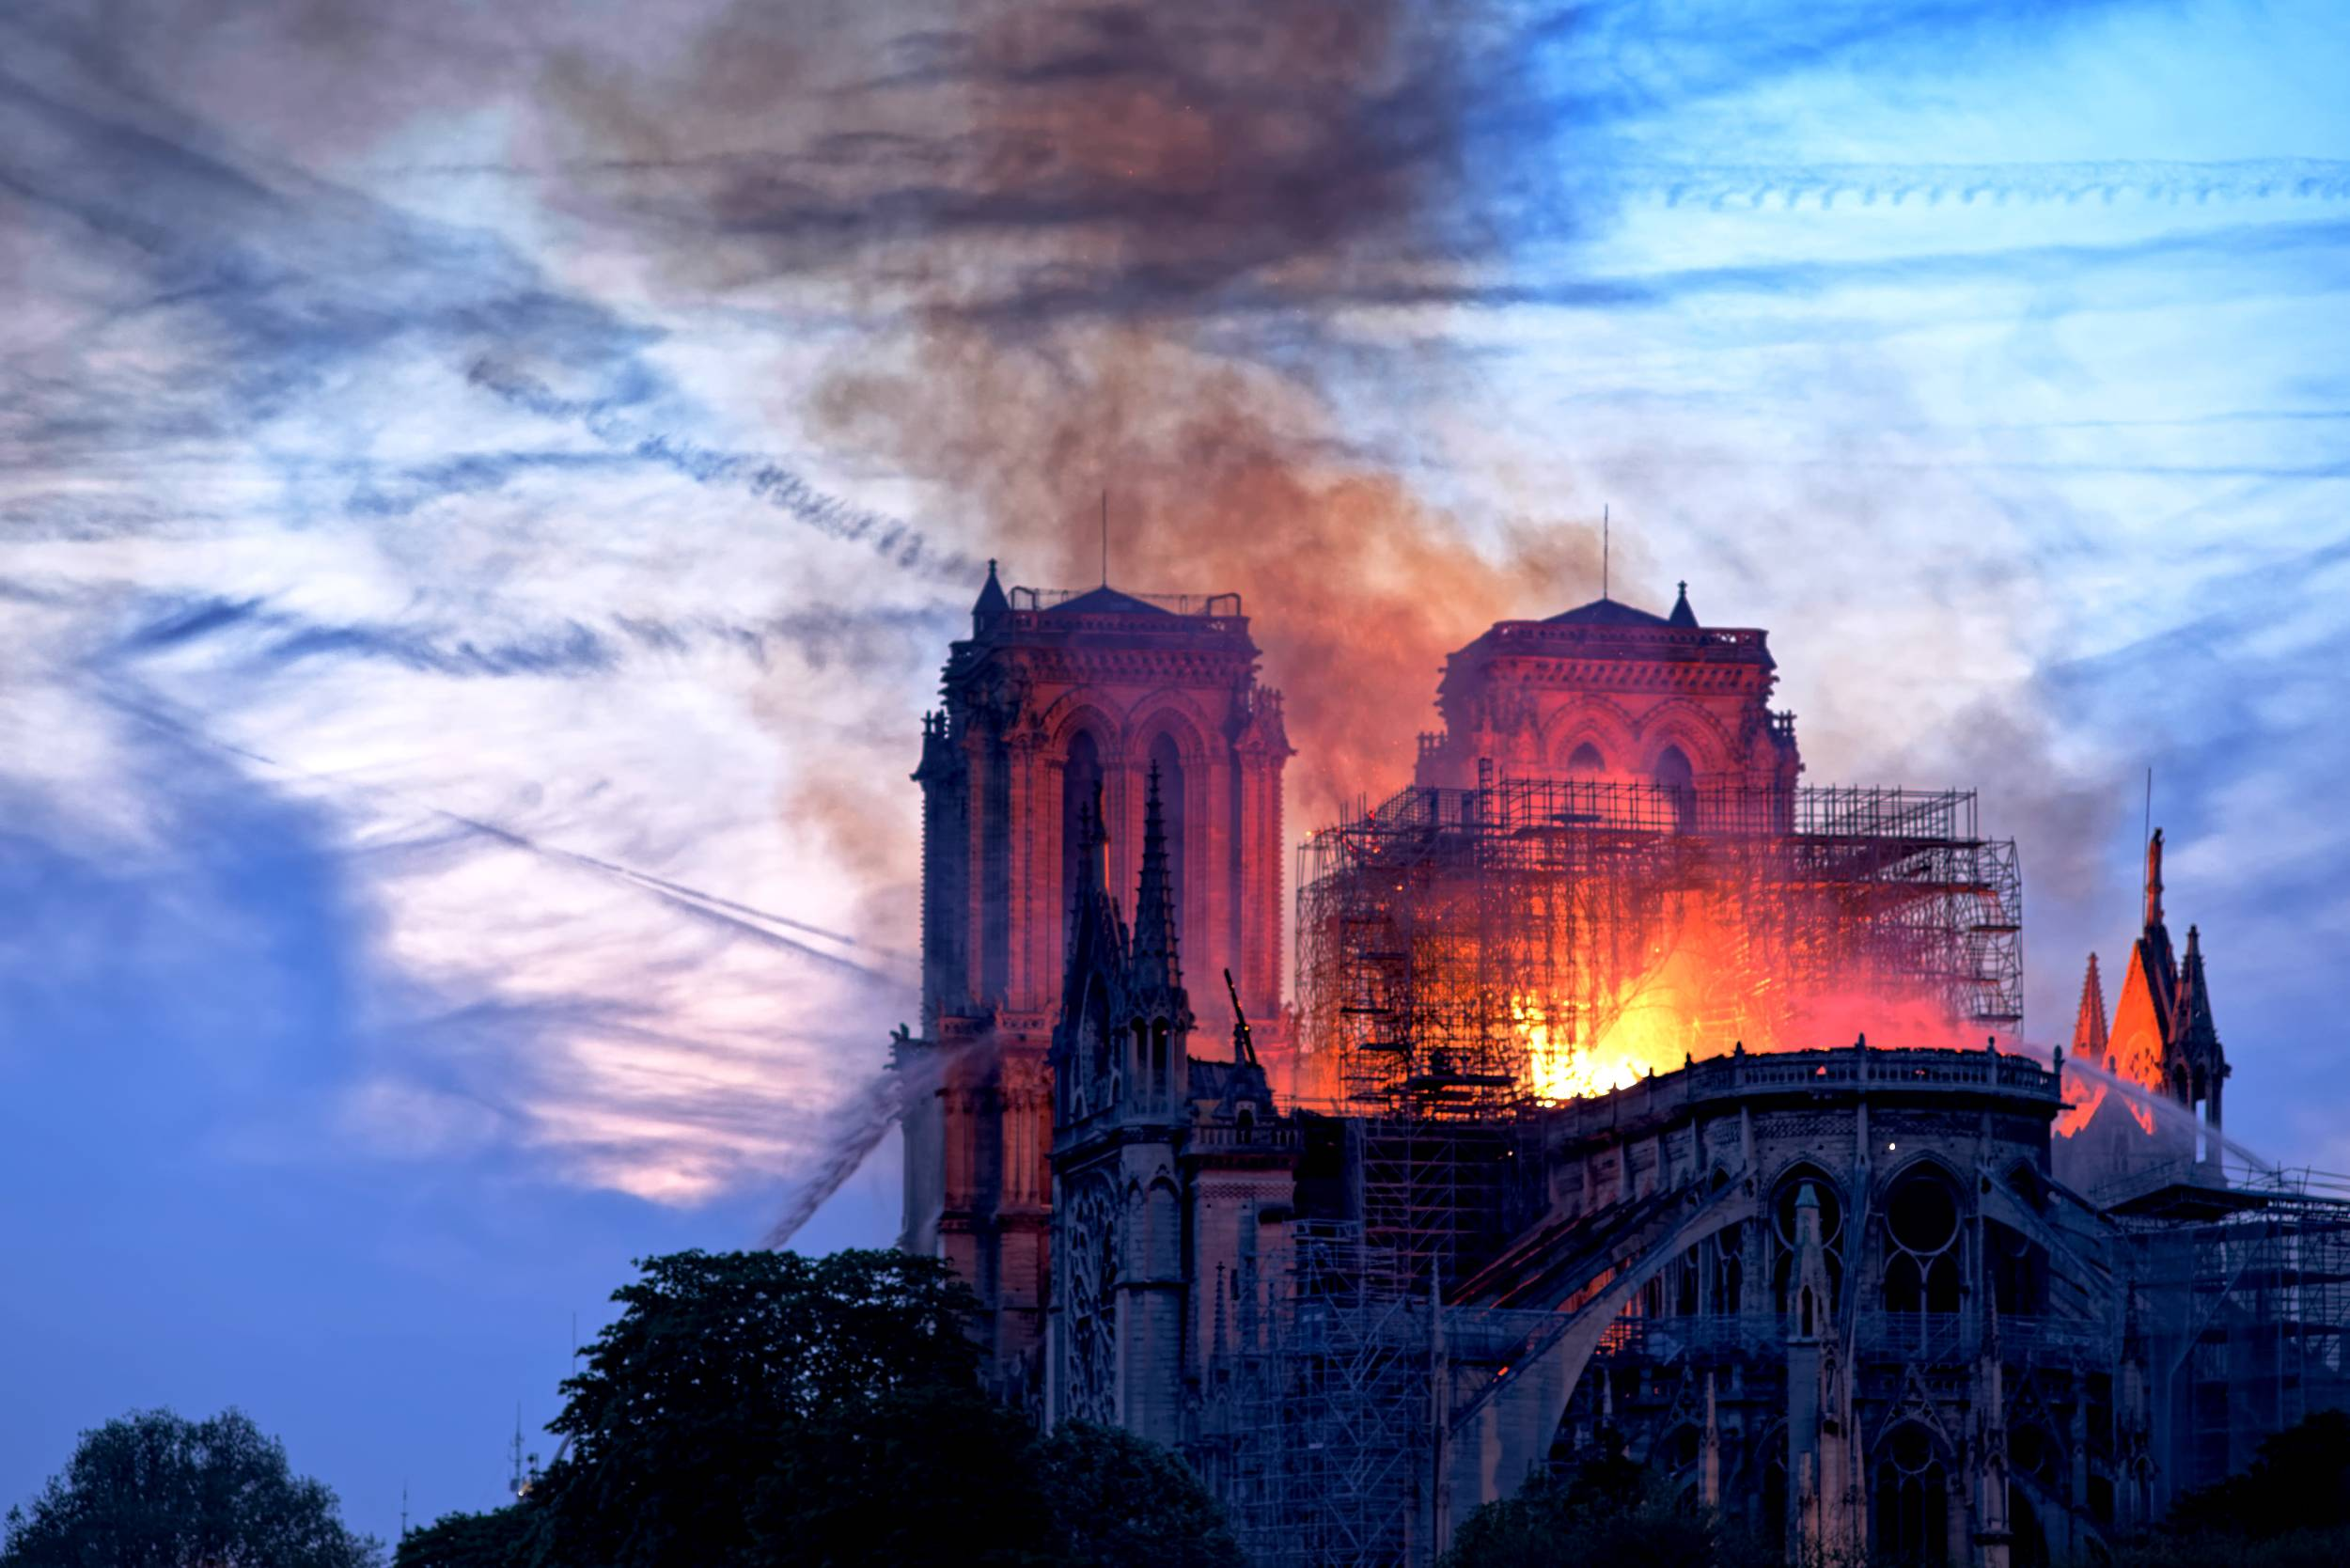 Cathedrale Notre-Dame de Paris © Olivier Mabelly